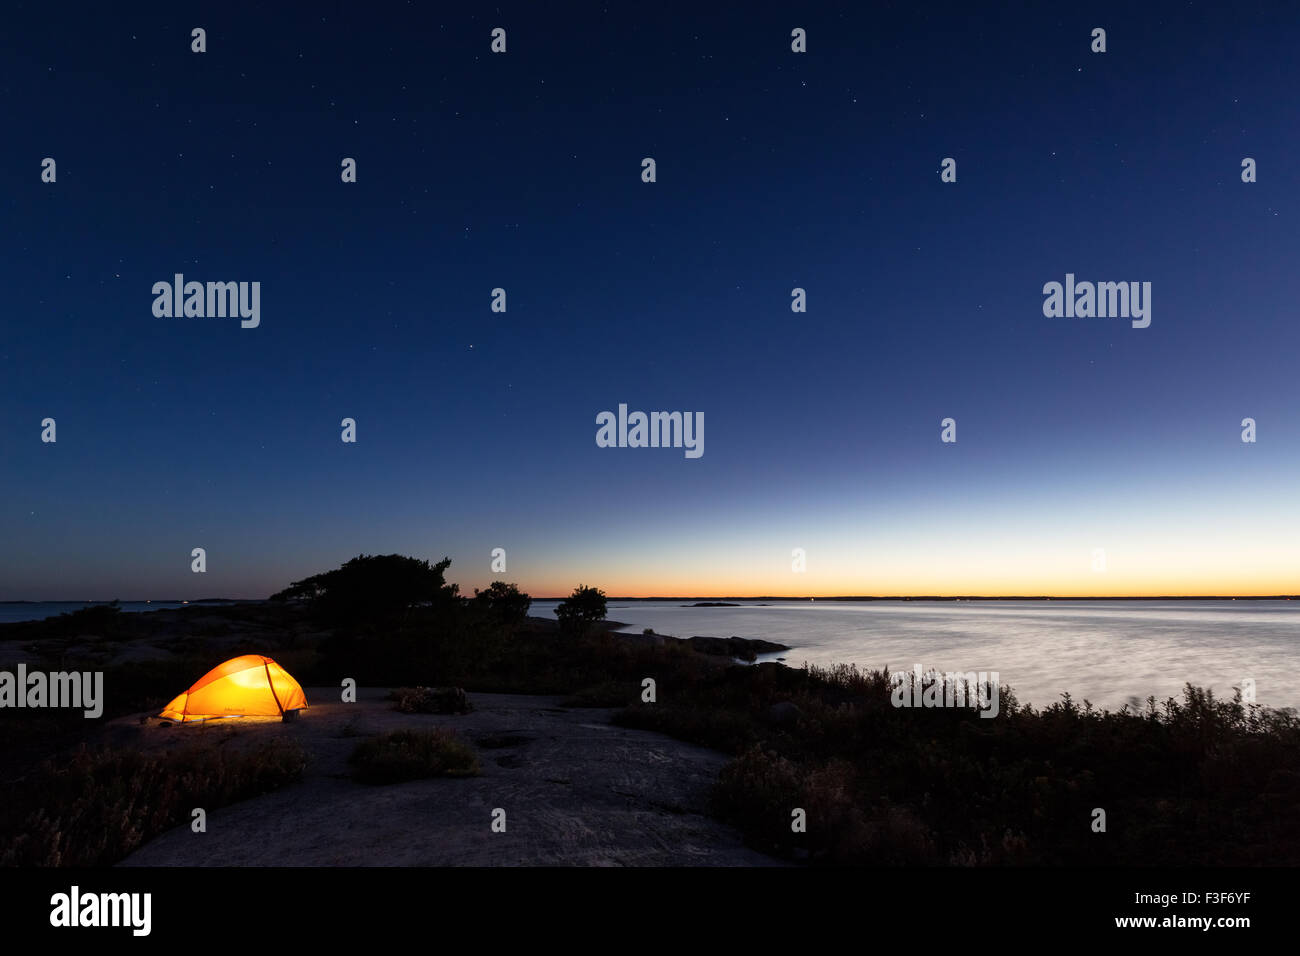 Night arrives at Örskär island, Espoo, Finland, Europe, EU - Stock Image